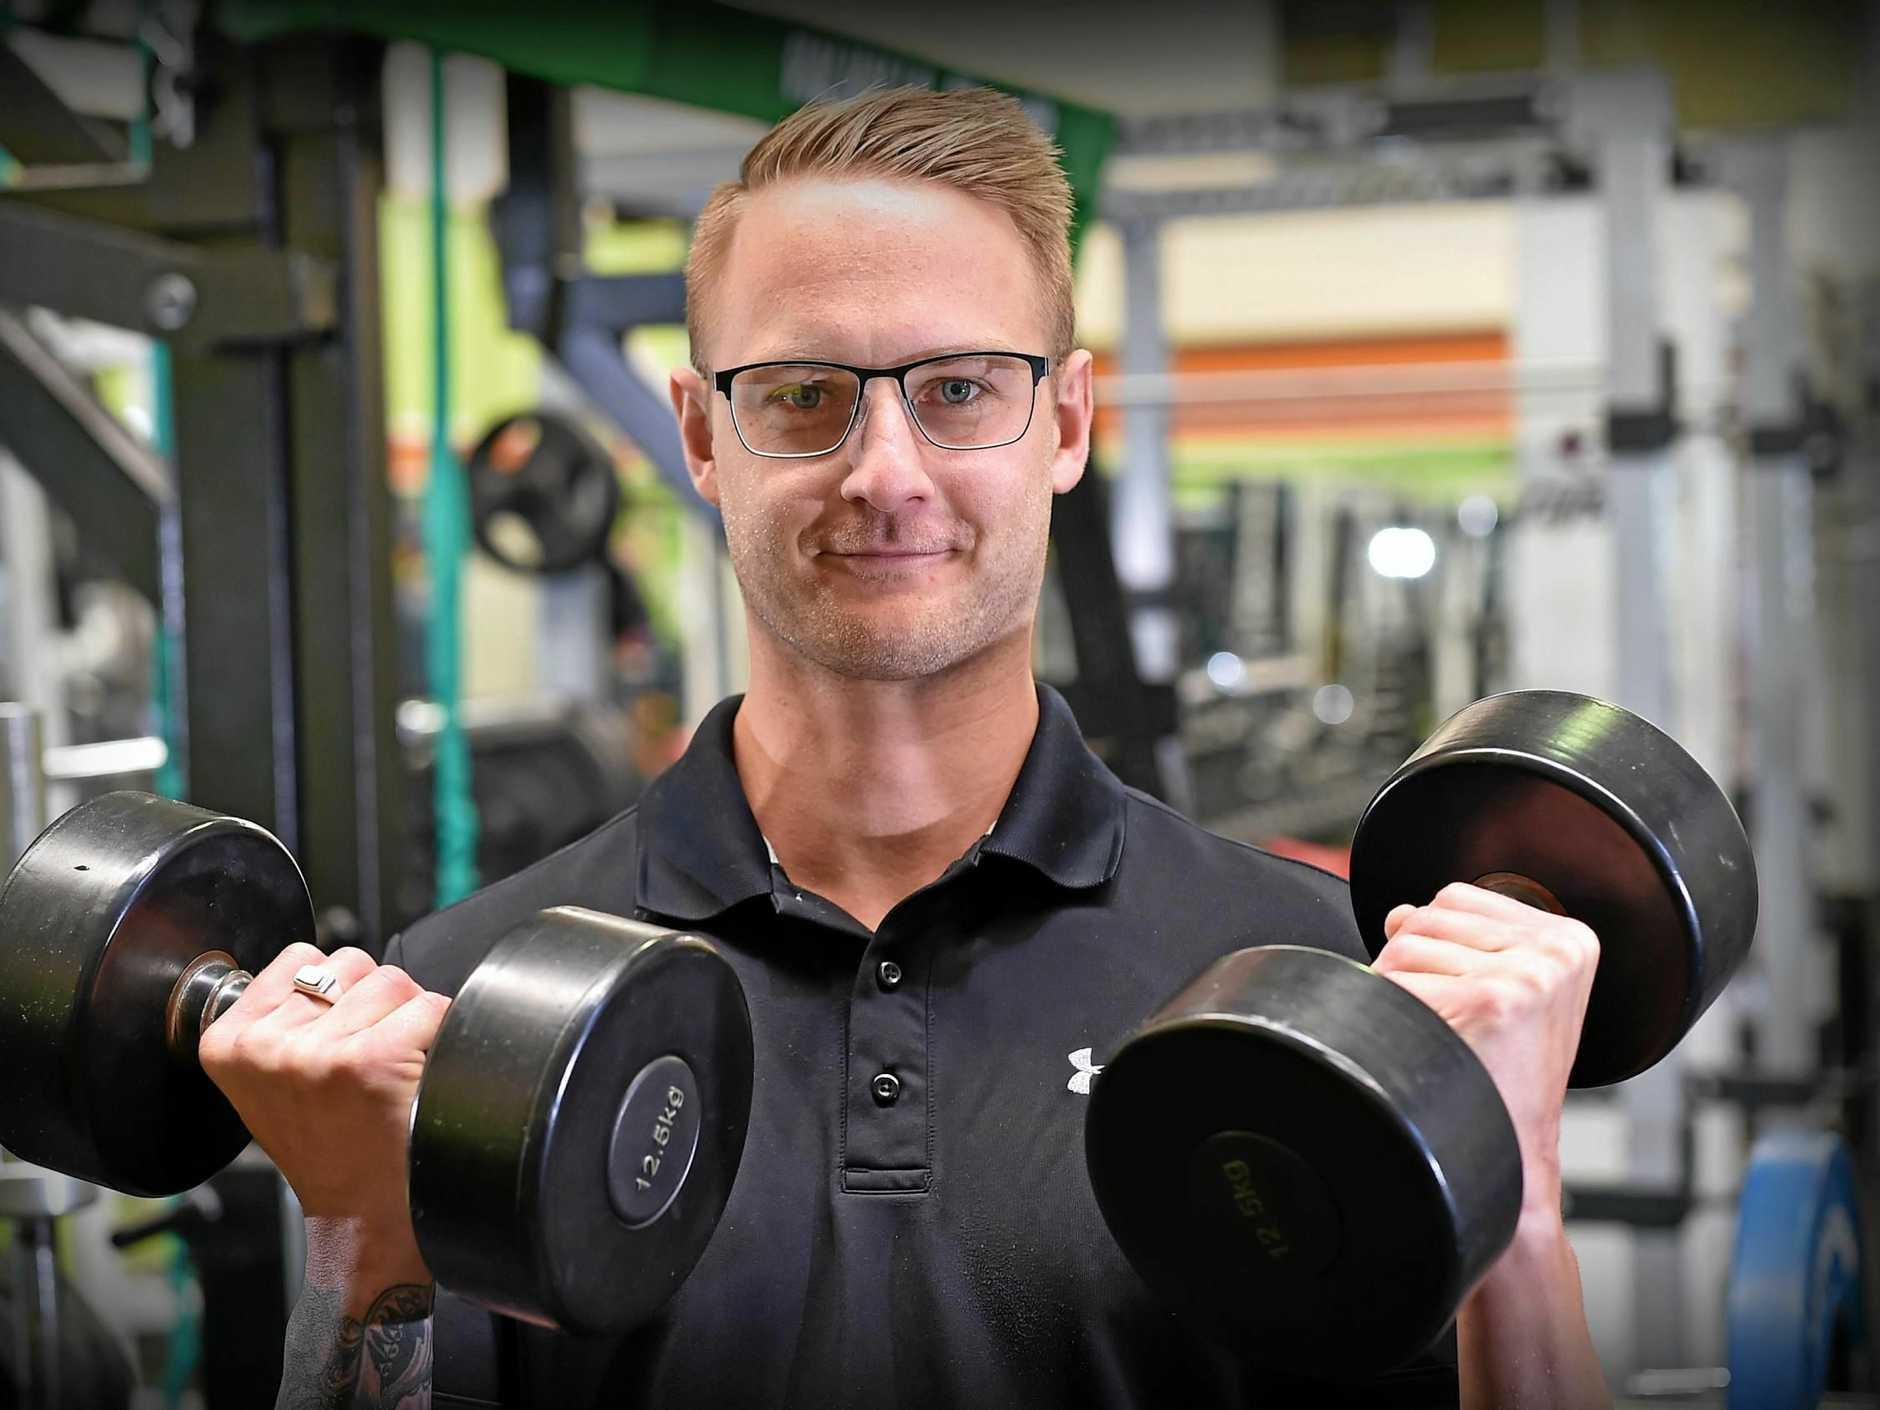 Brad Schafer from Ply Fitness.